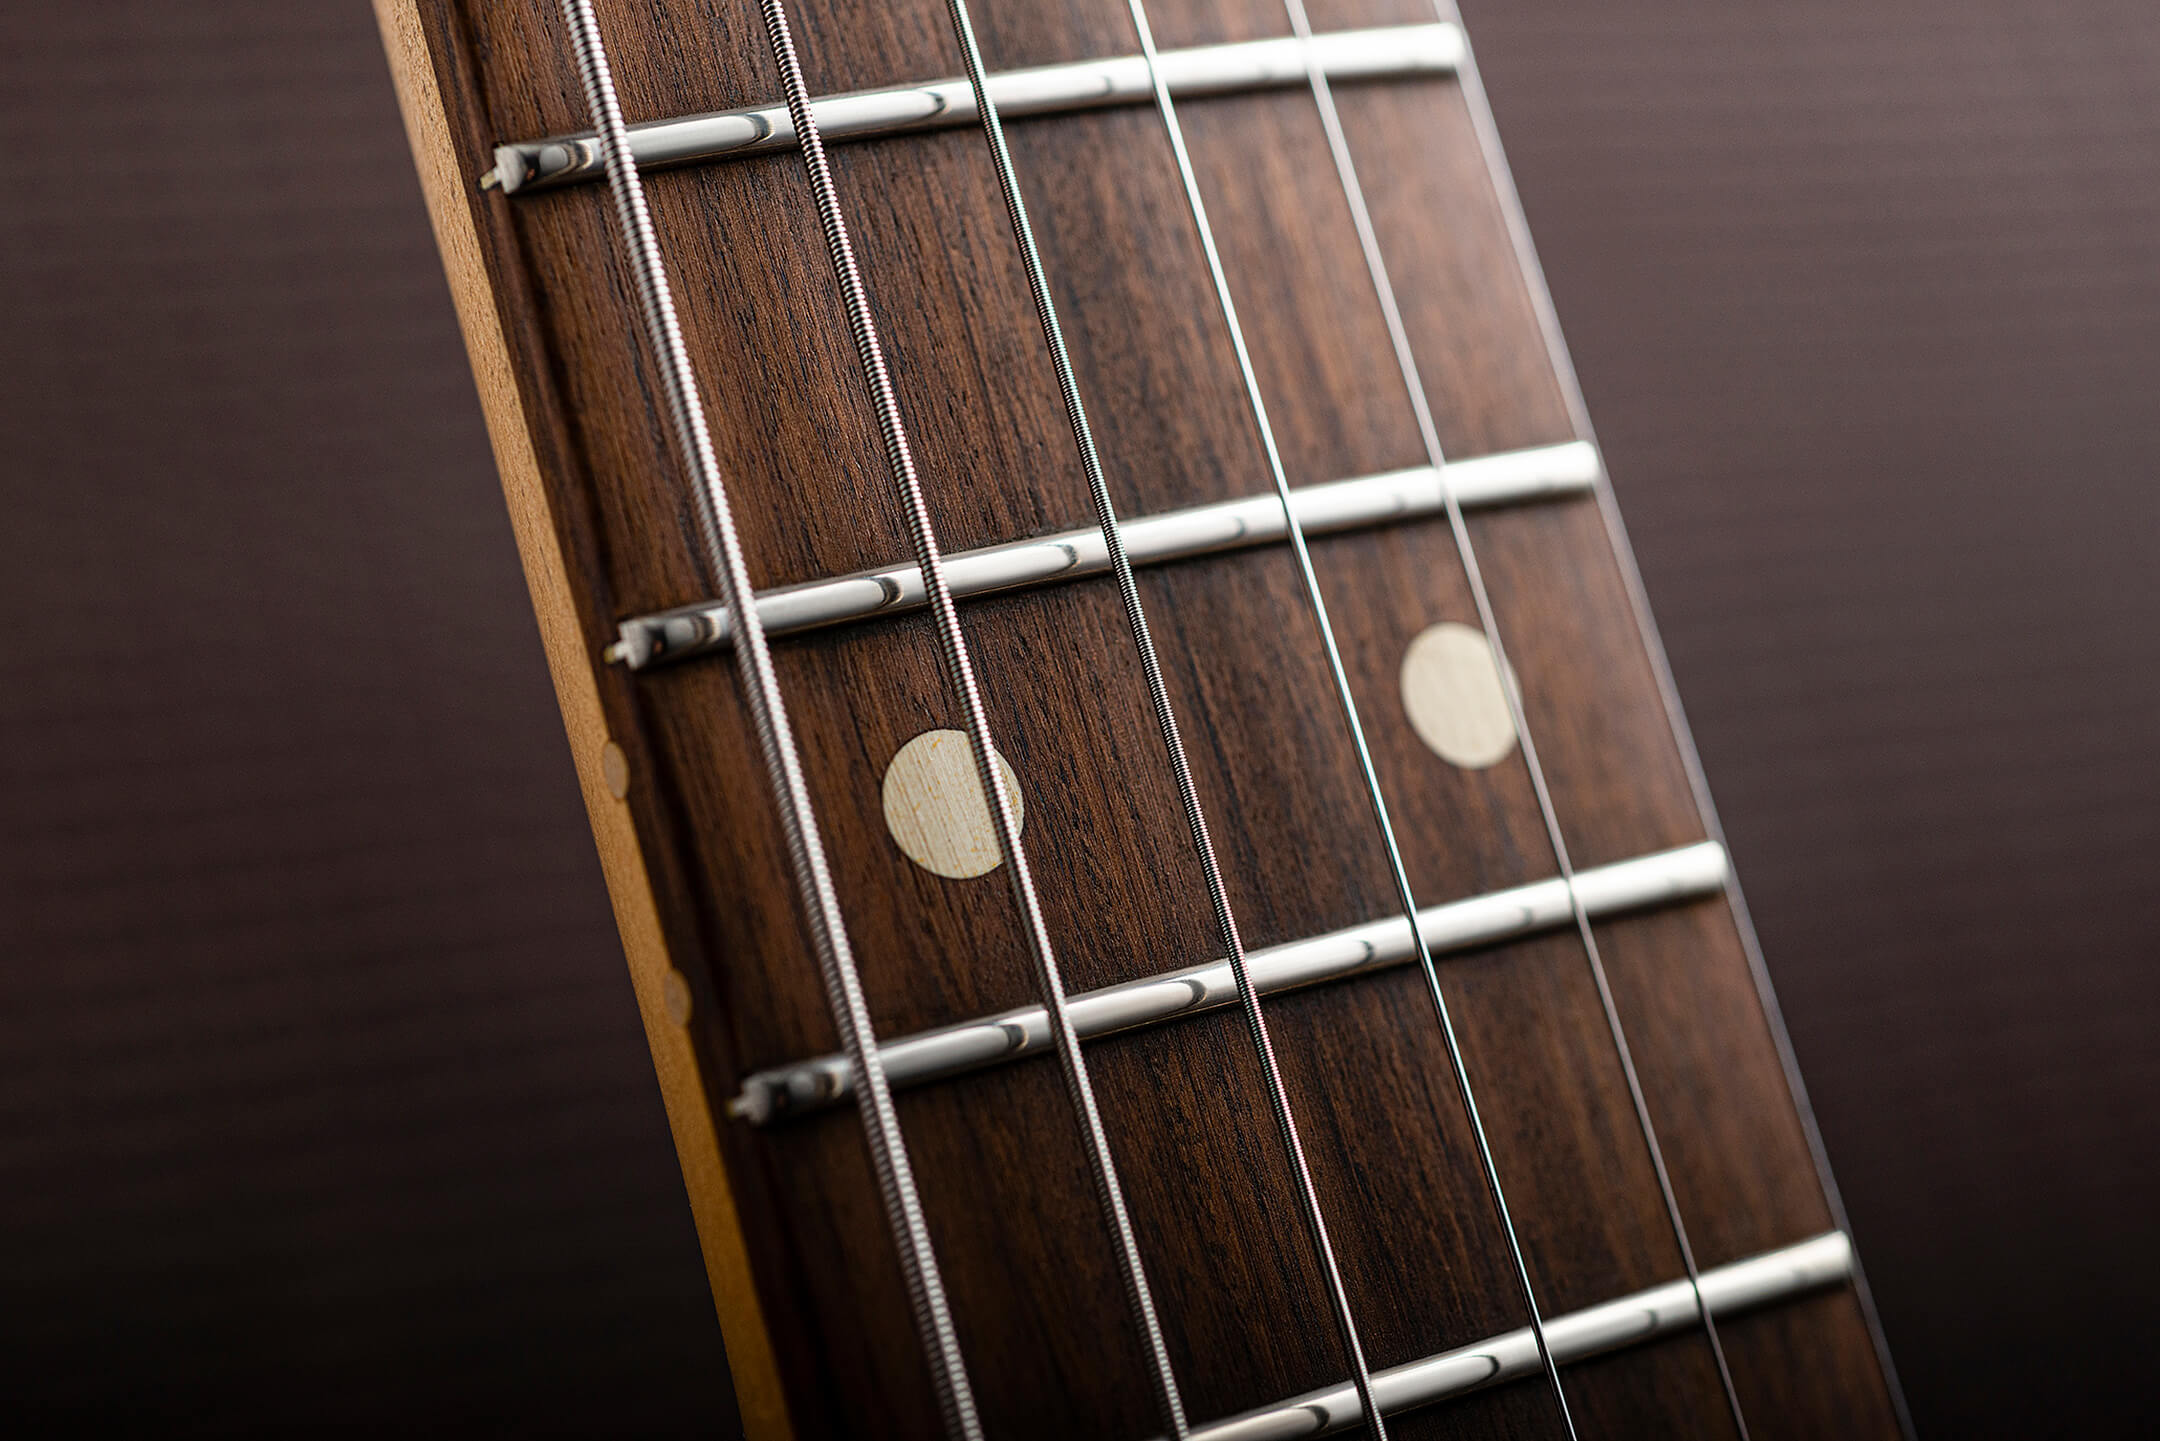 Fender Vintera Road Worn 60s Stratocaster Fretboard